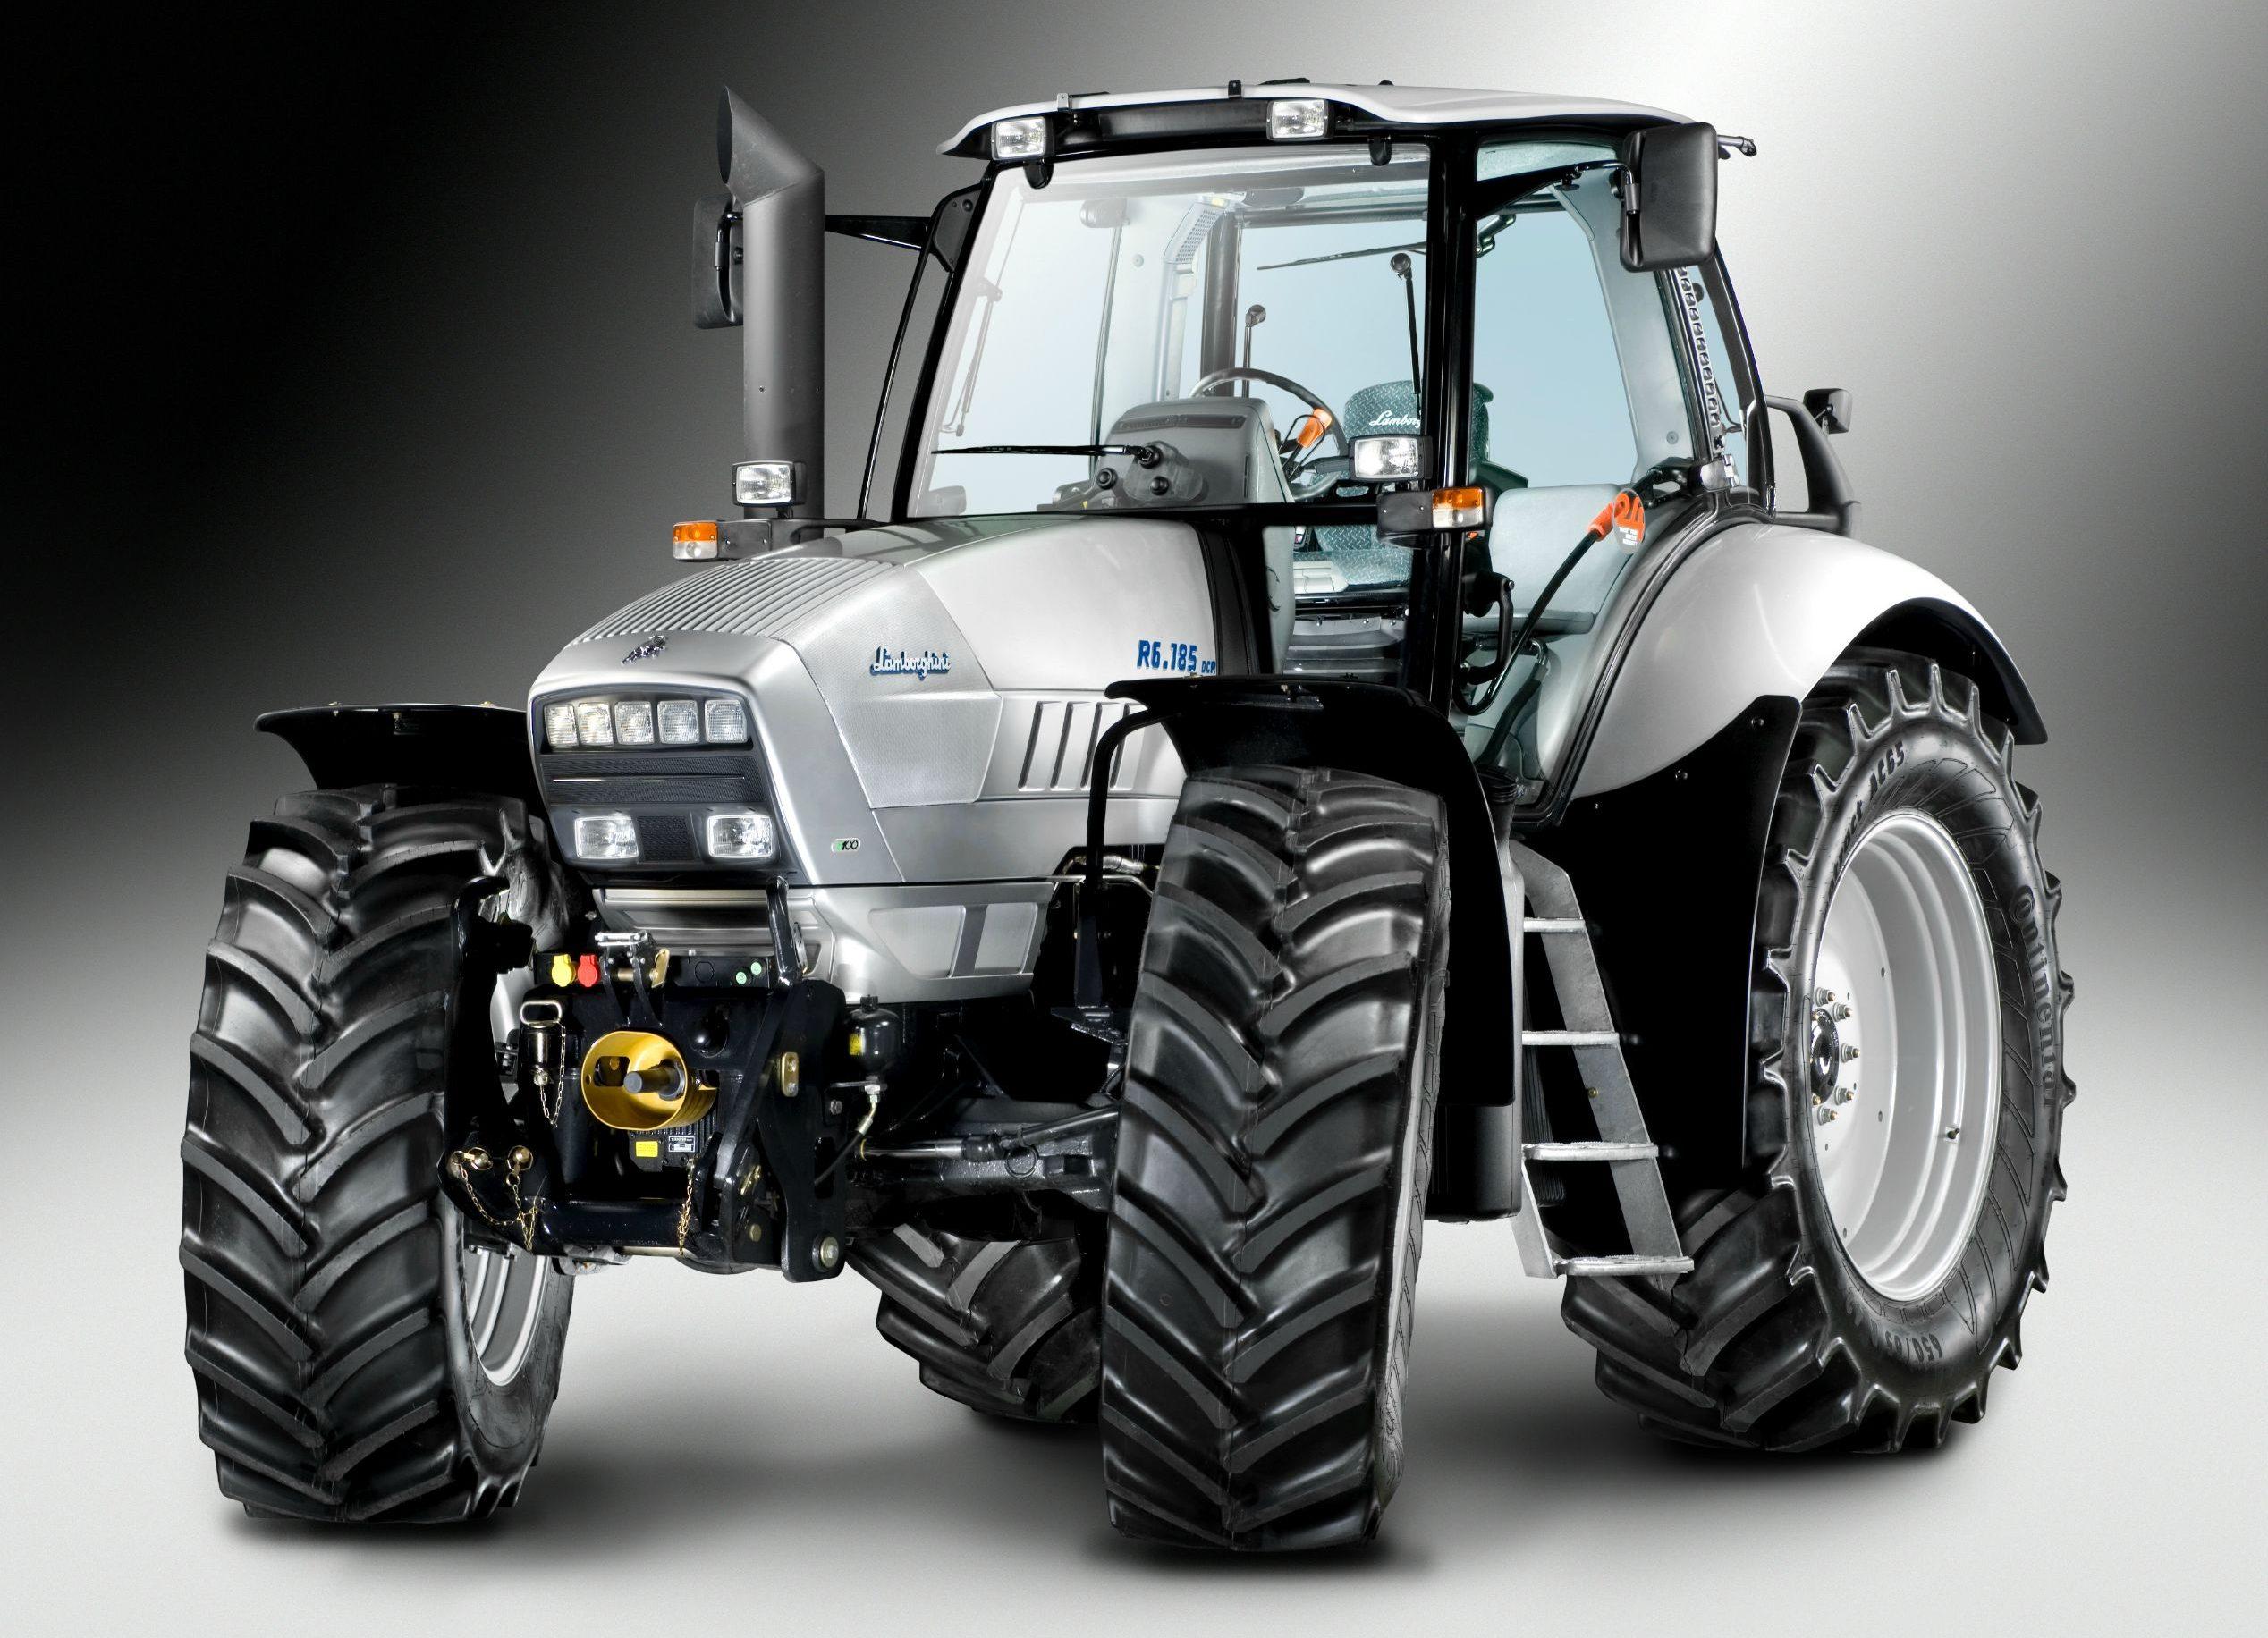 Oil Suitable For Lamborghini Tractor Including 15w 40 10w